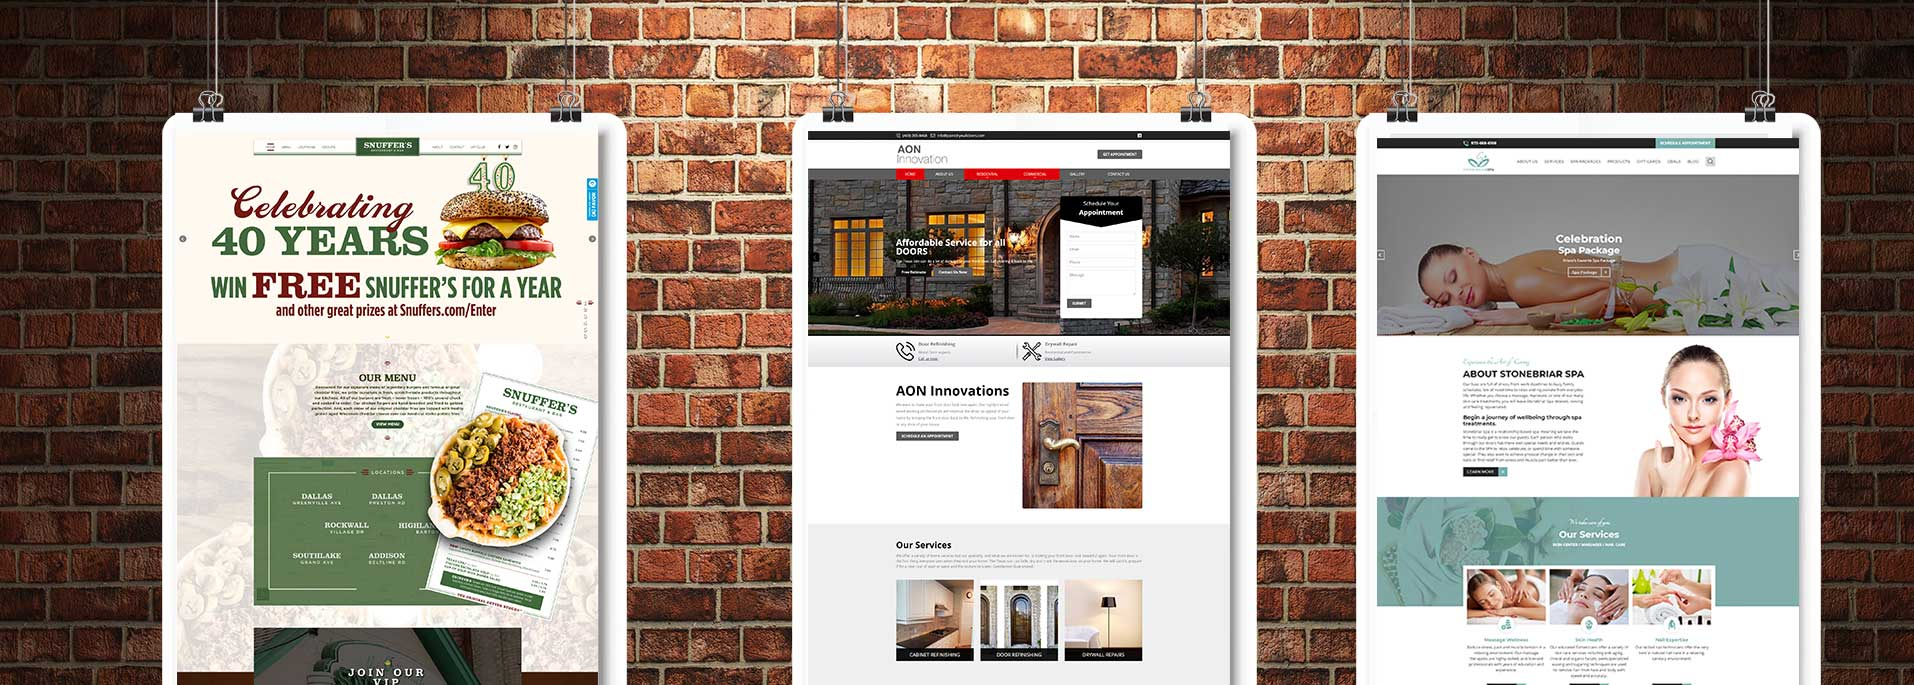 website design banner Wordpress & Custom Design